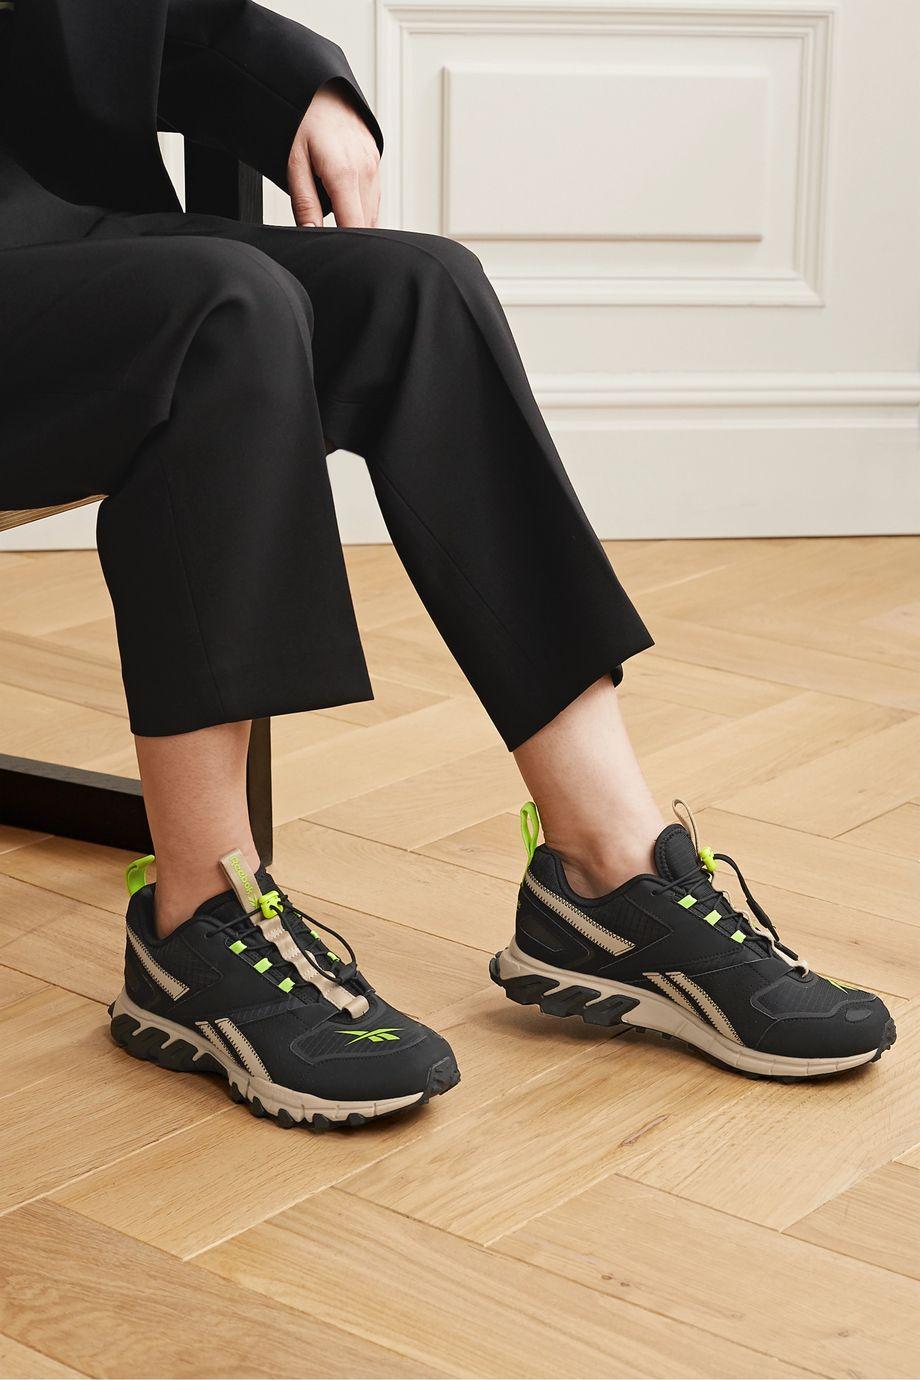 Reebok DMX Pert ripstop and neoprene sneakers